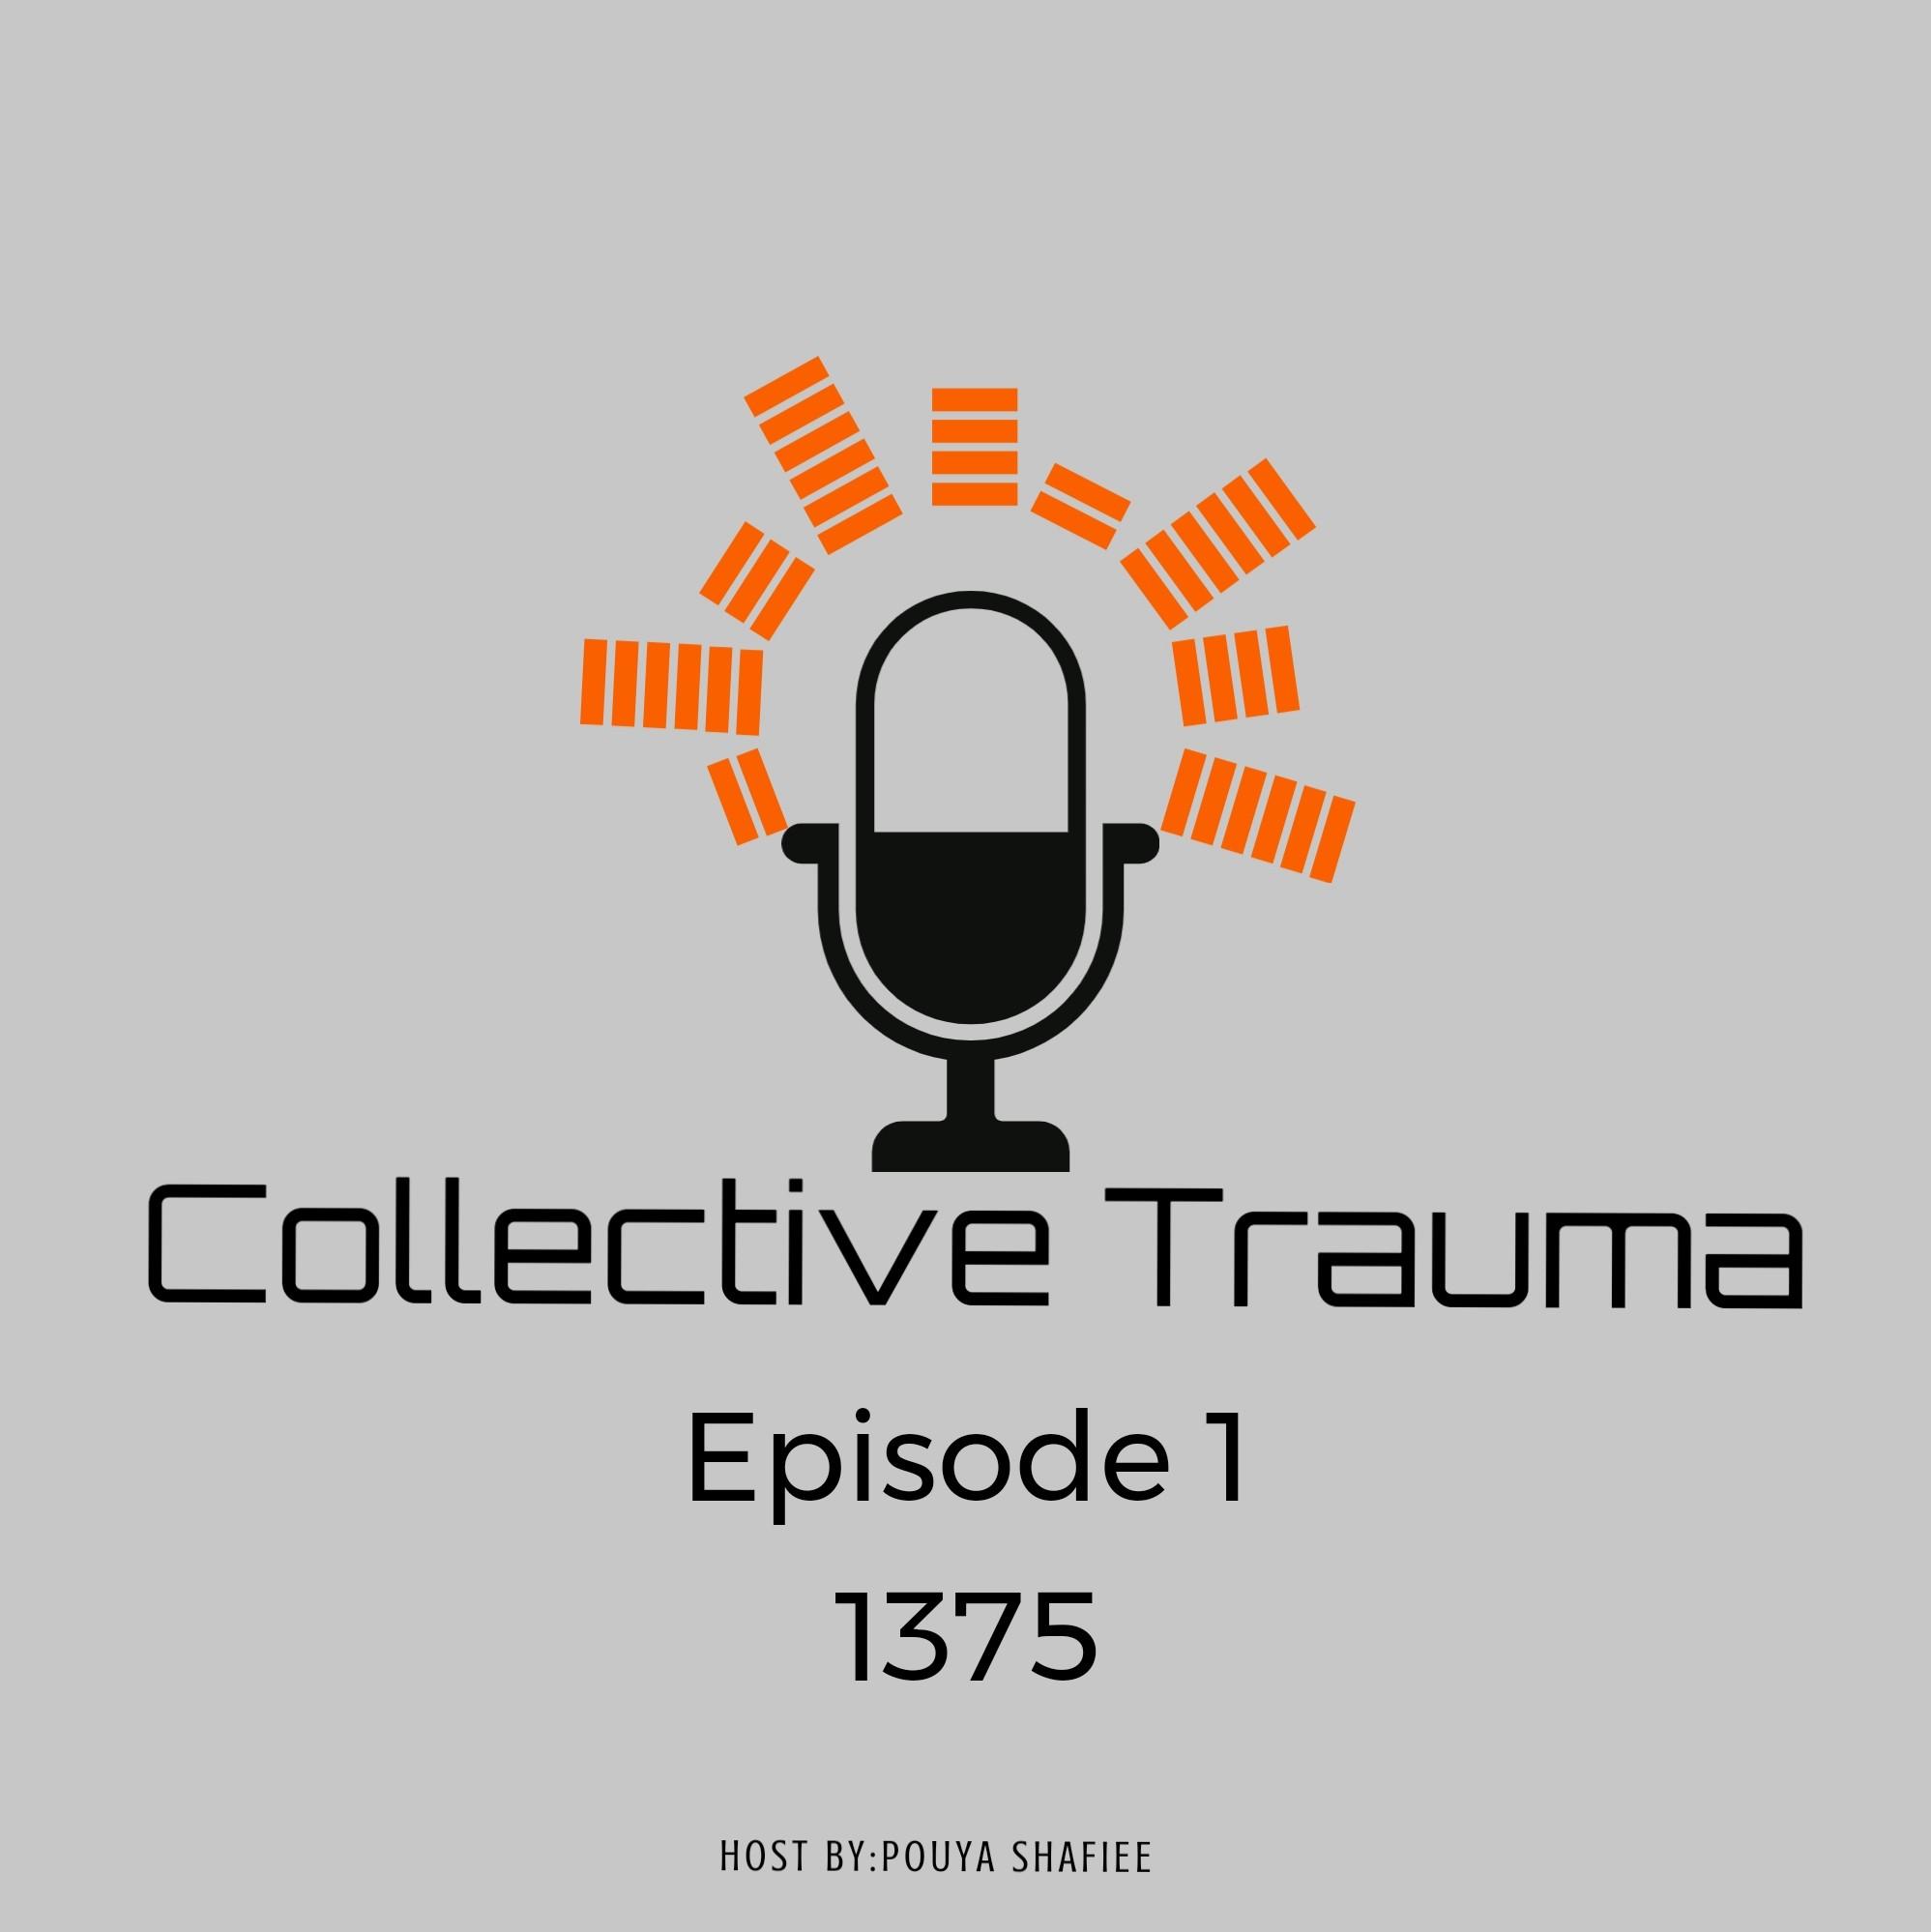 Collective Trauma S1E01  اپیزود اول فصل اول ترومای جمعی